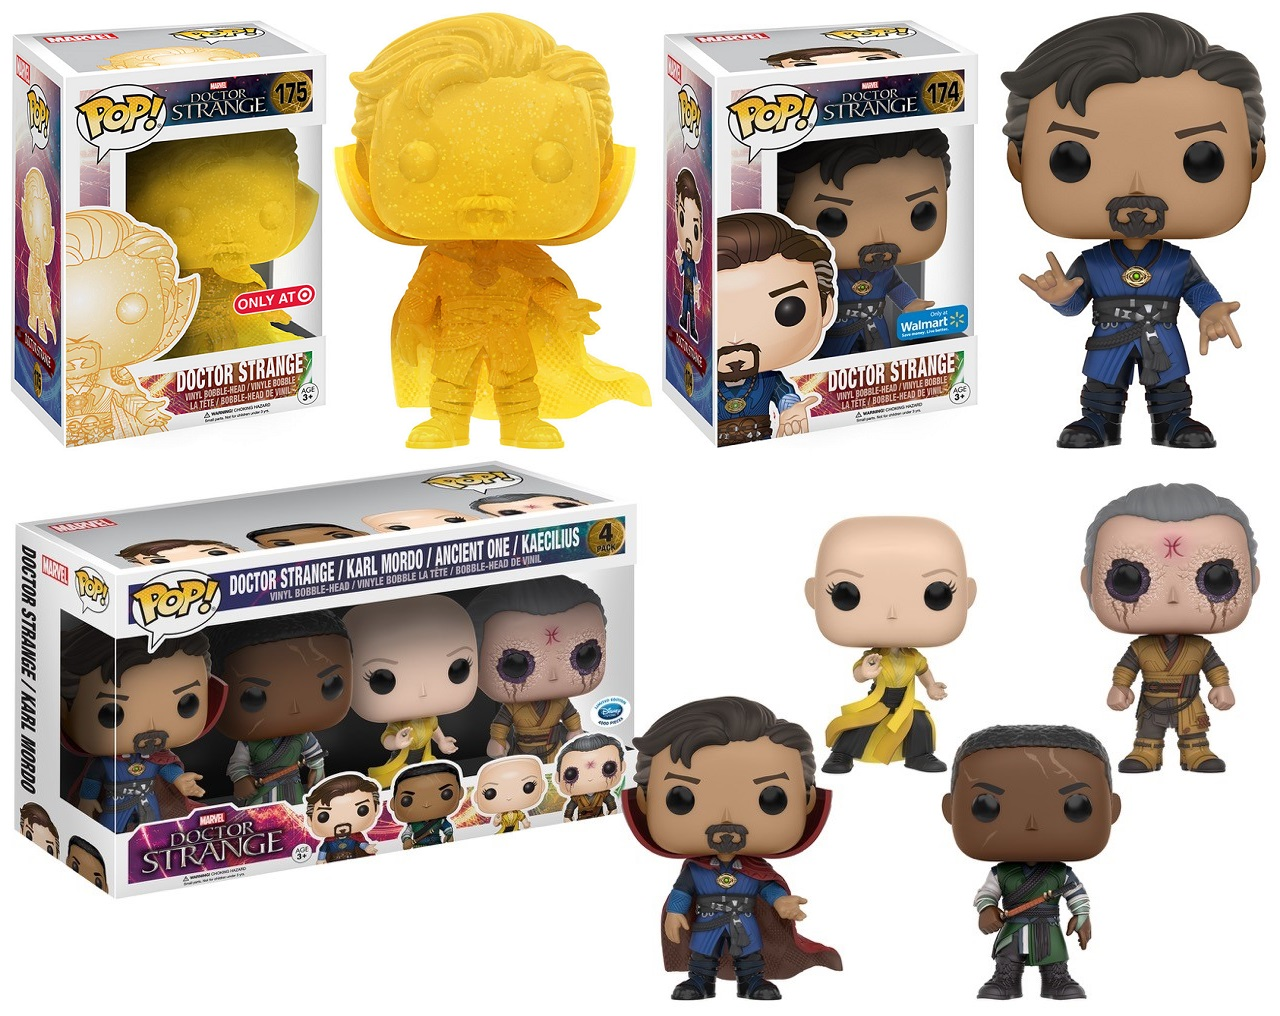 fe93006f252 Retailer Exclusive Doctor Strange Movie Pop! Marvel Variant Figures by Funko